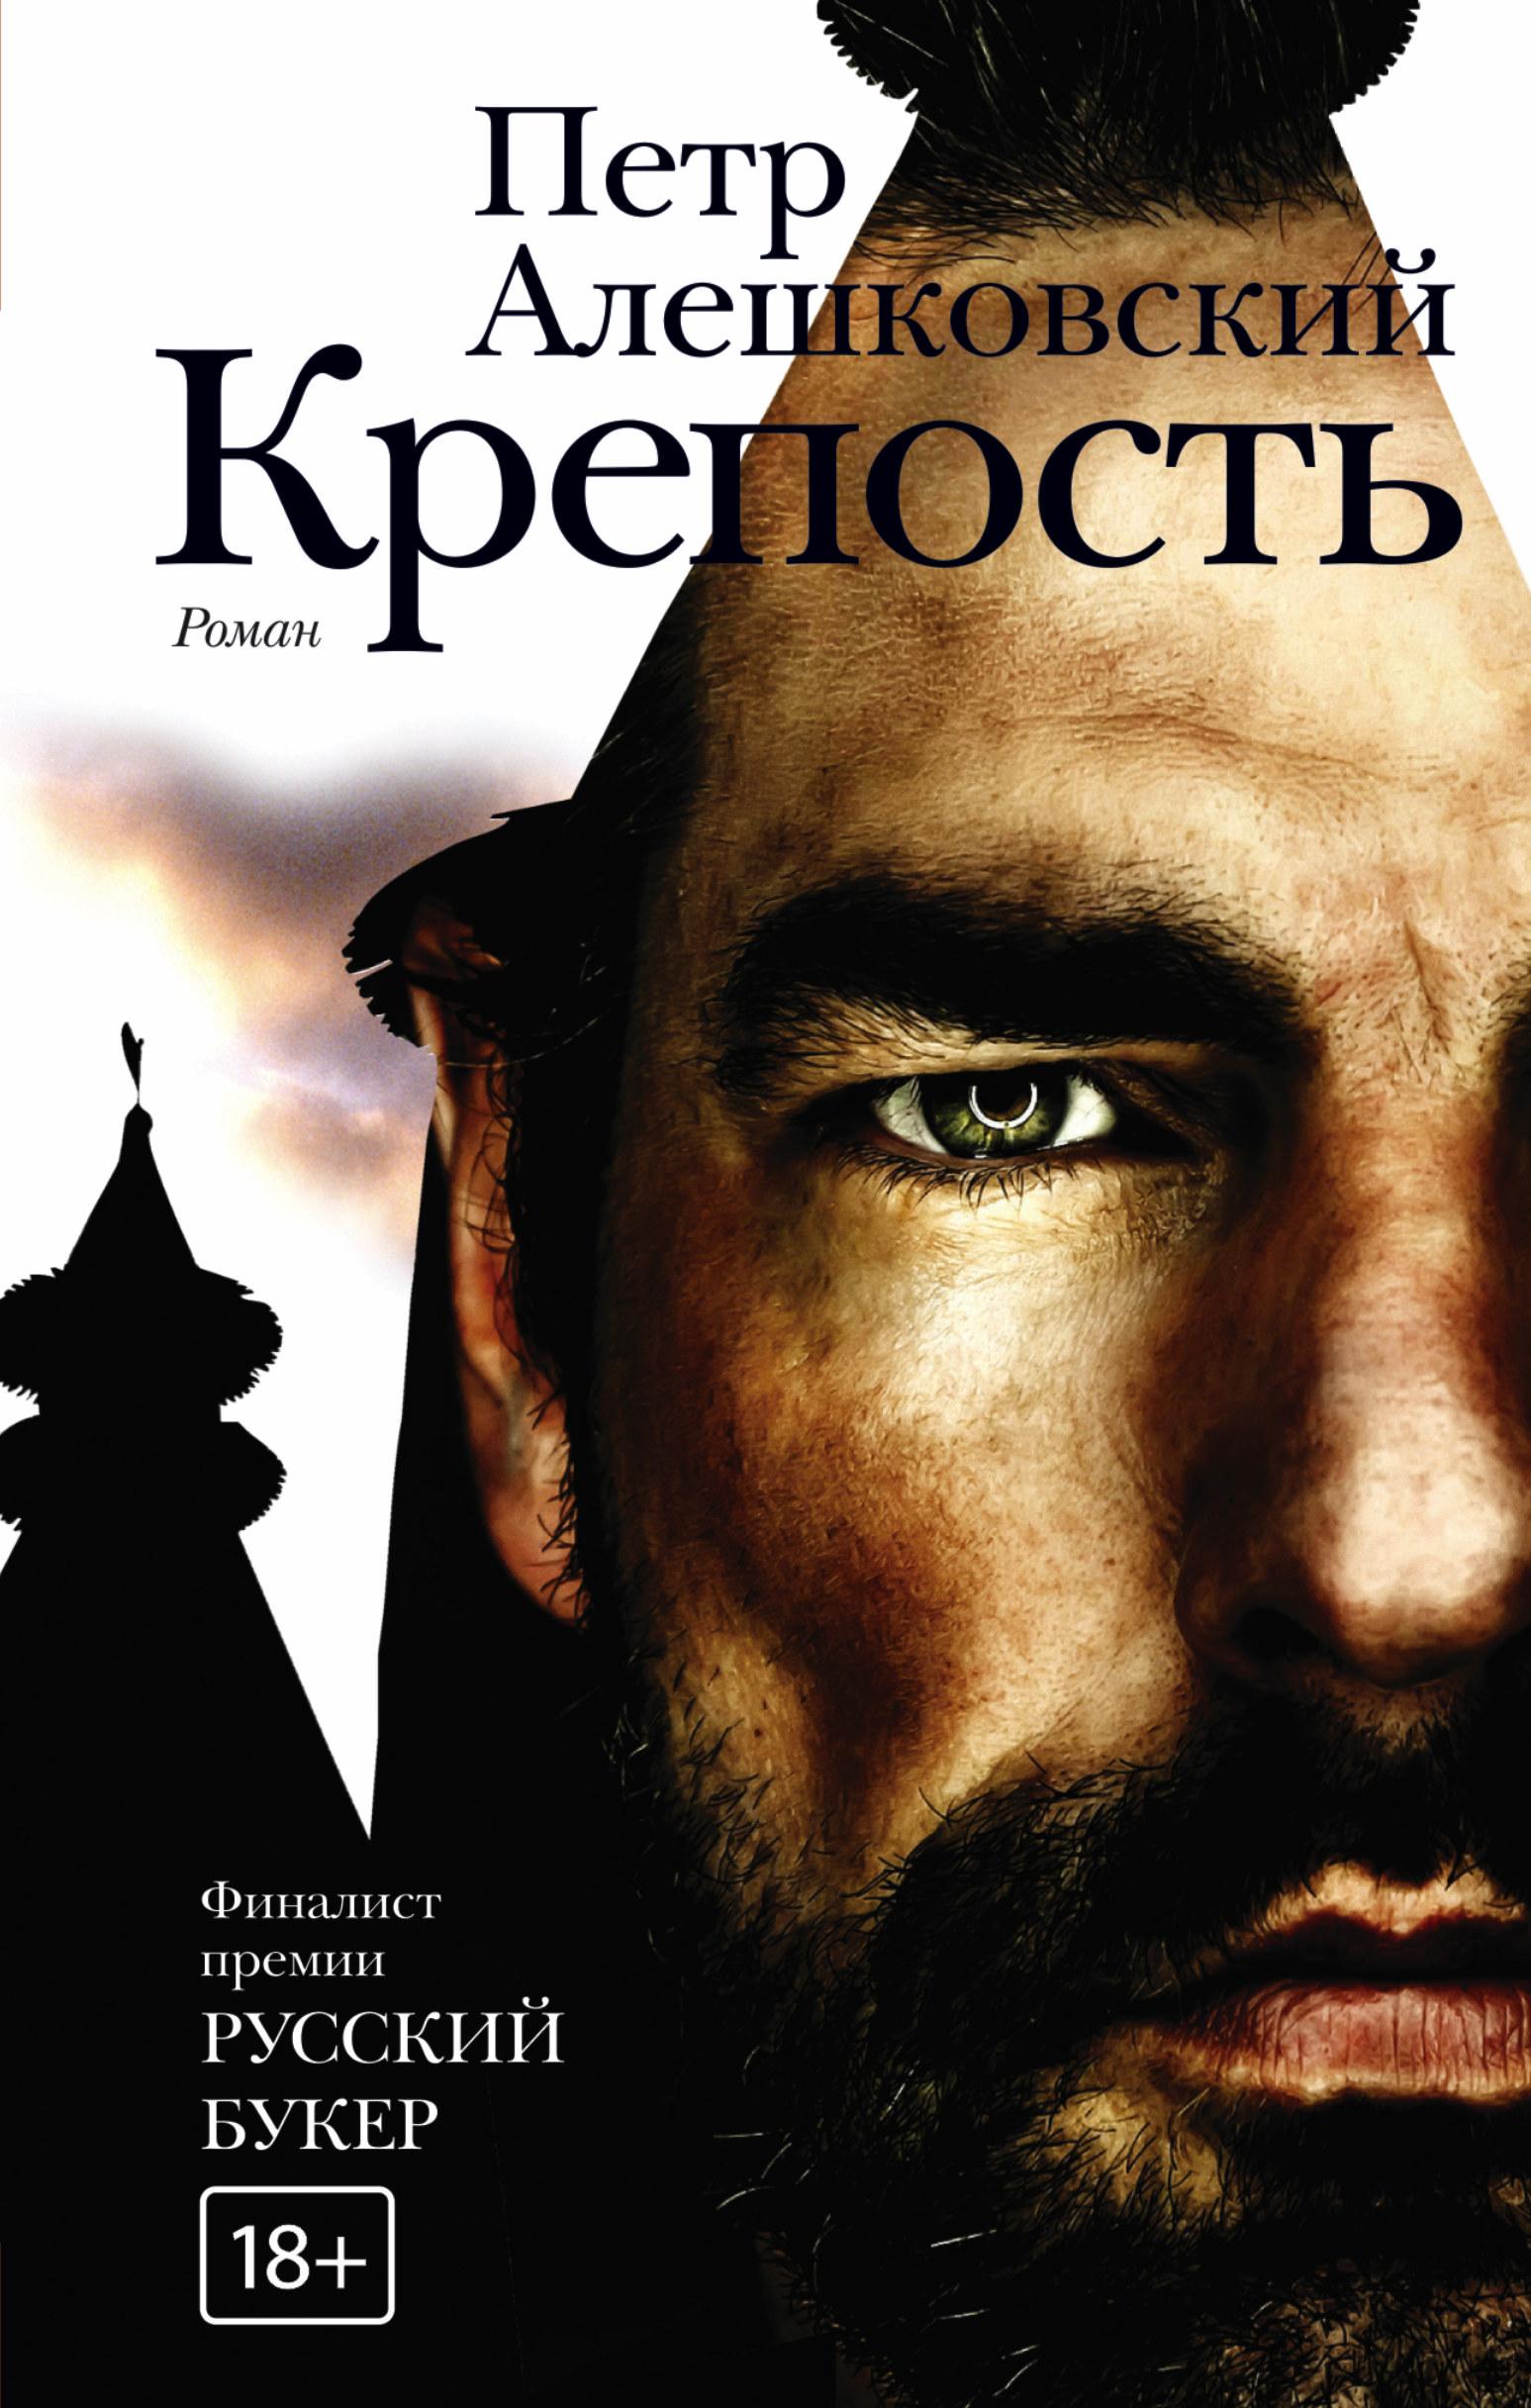 Петр Алешковский Крепость алешковский петр маркович крепость